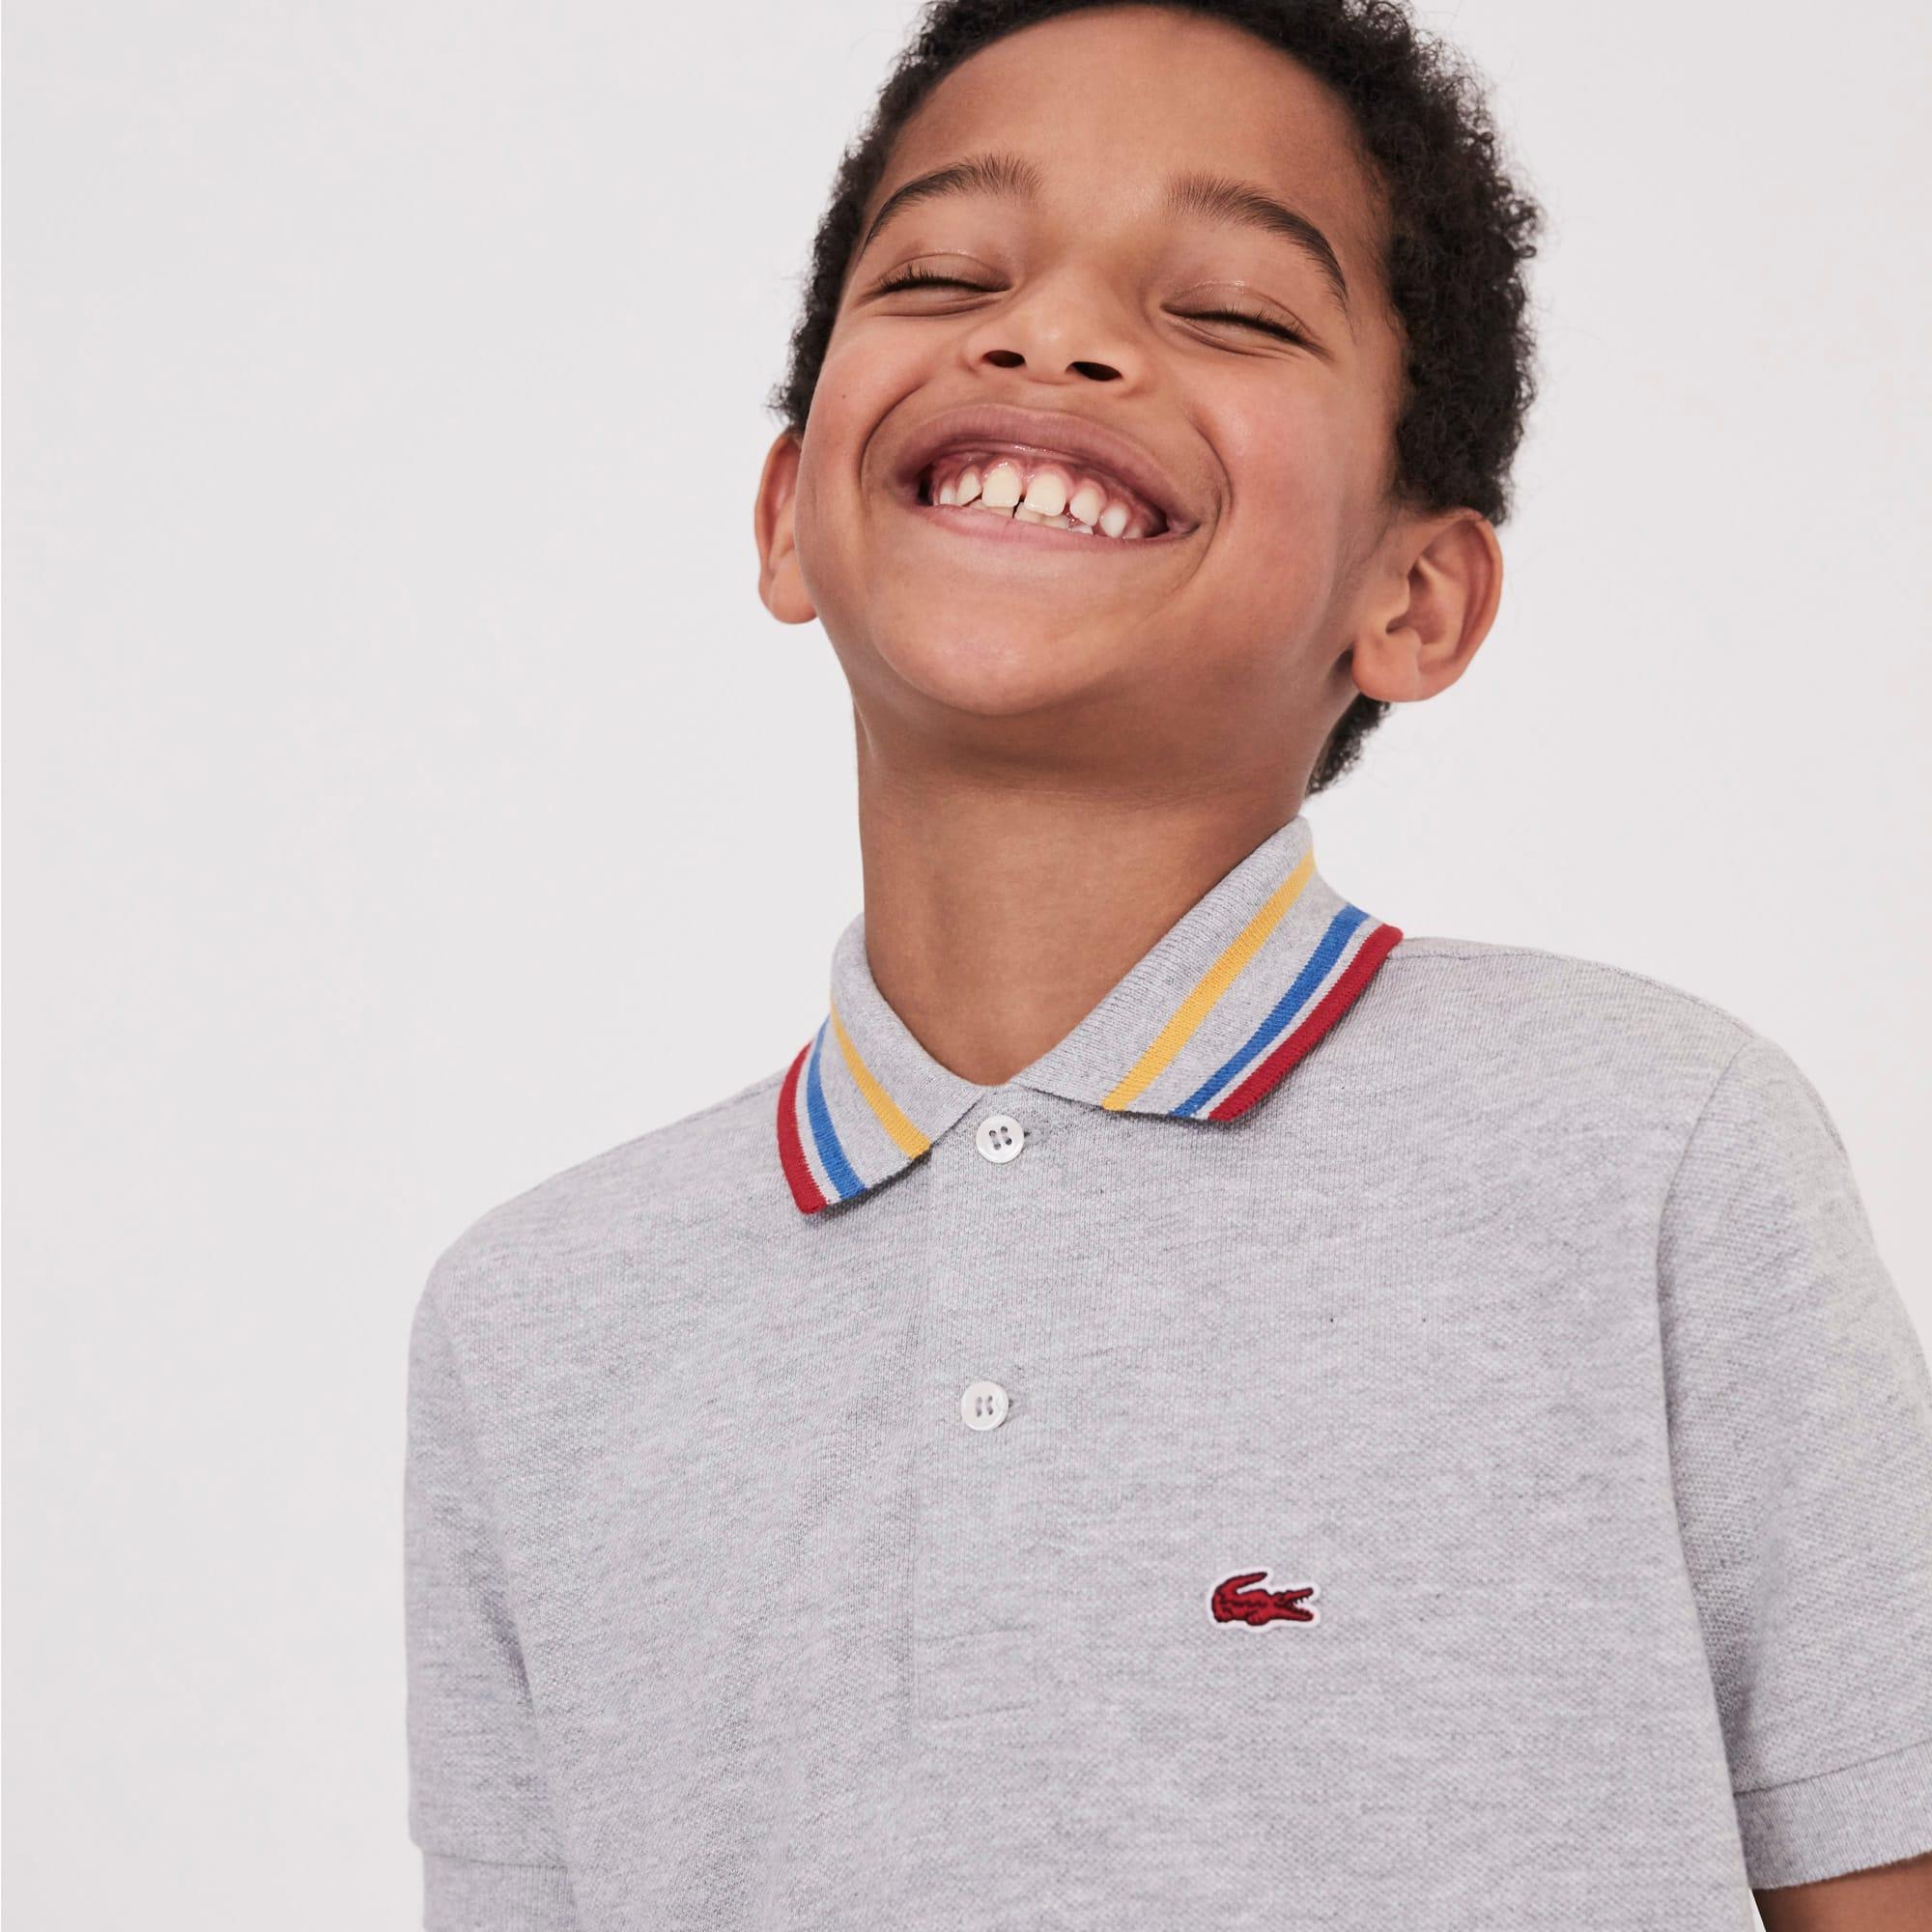 9f9287ec Boys' Lacoste Striped Neck Petit Piqué Polo Shirt